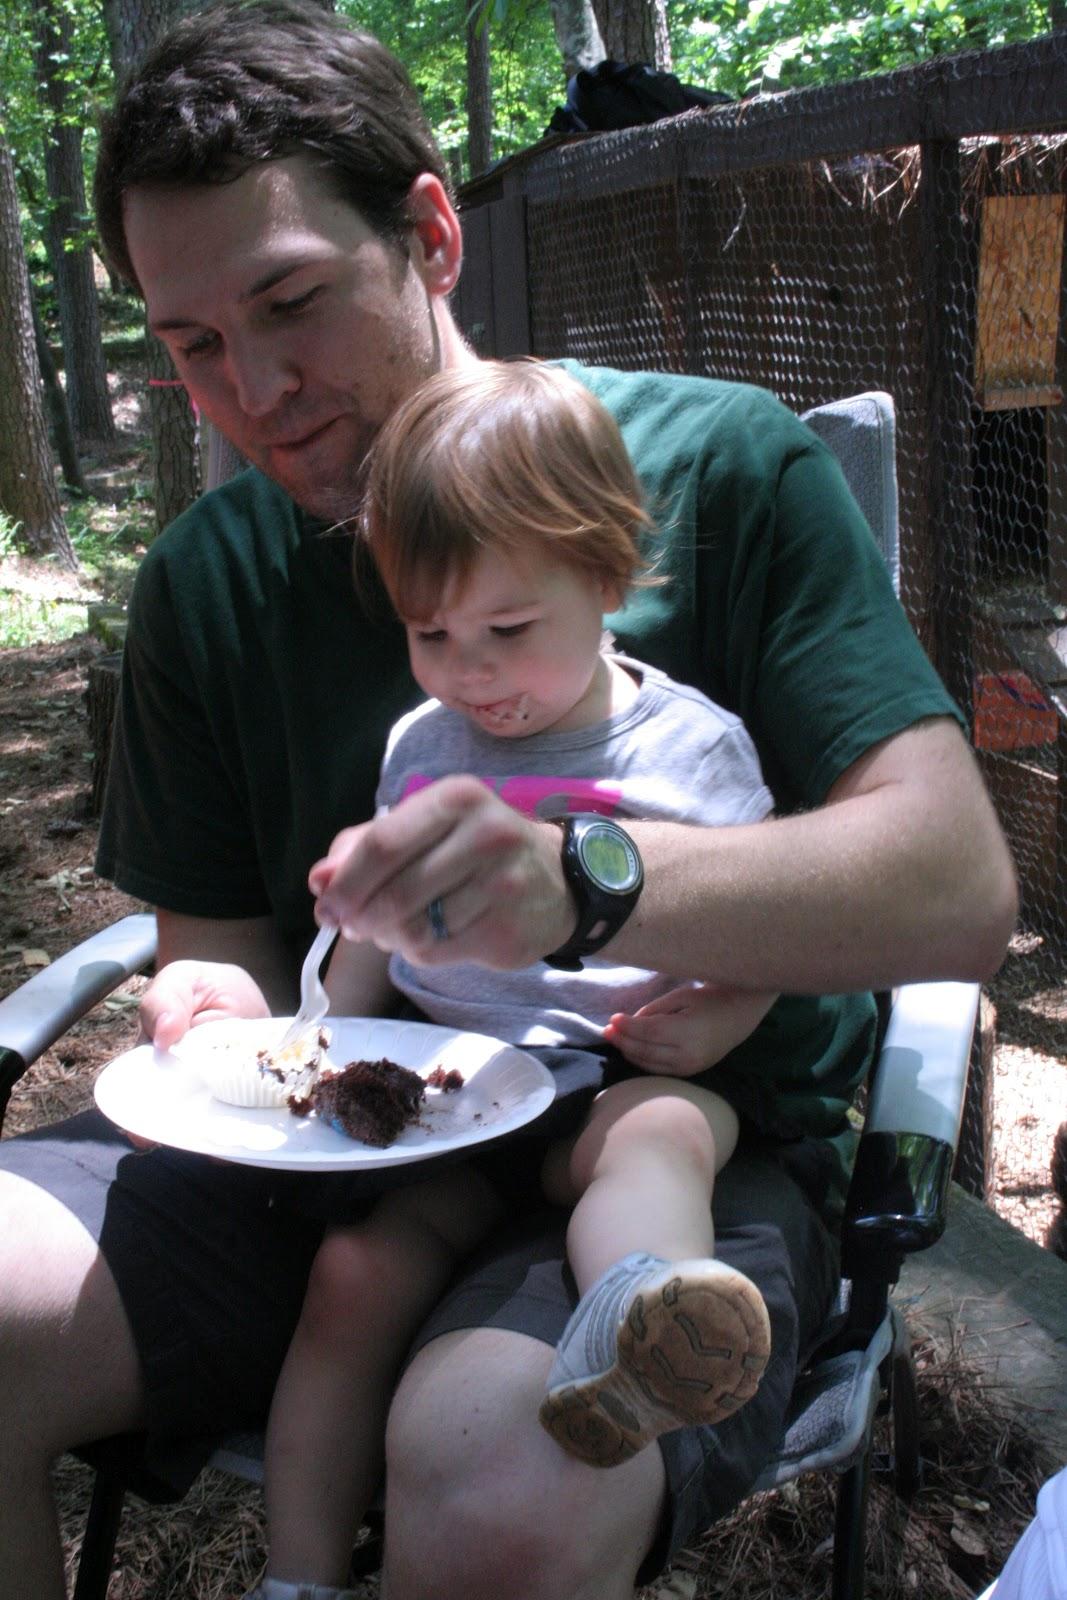 Katie leipprandt: may 2012